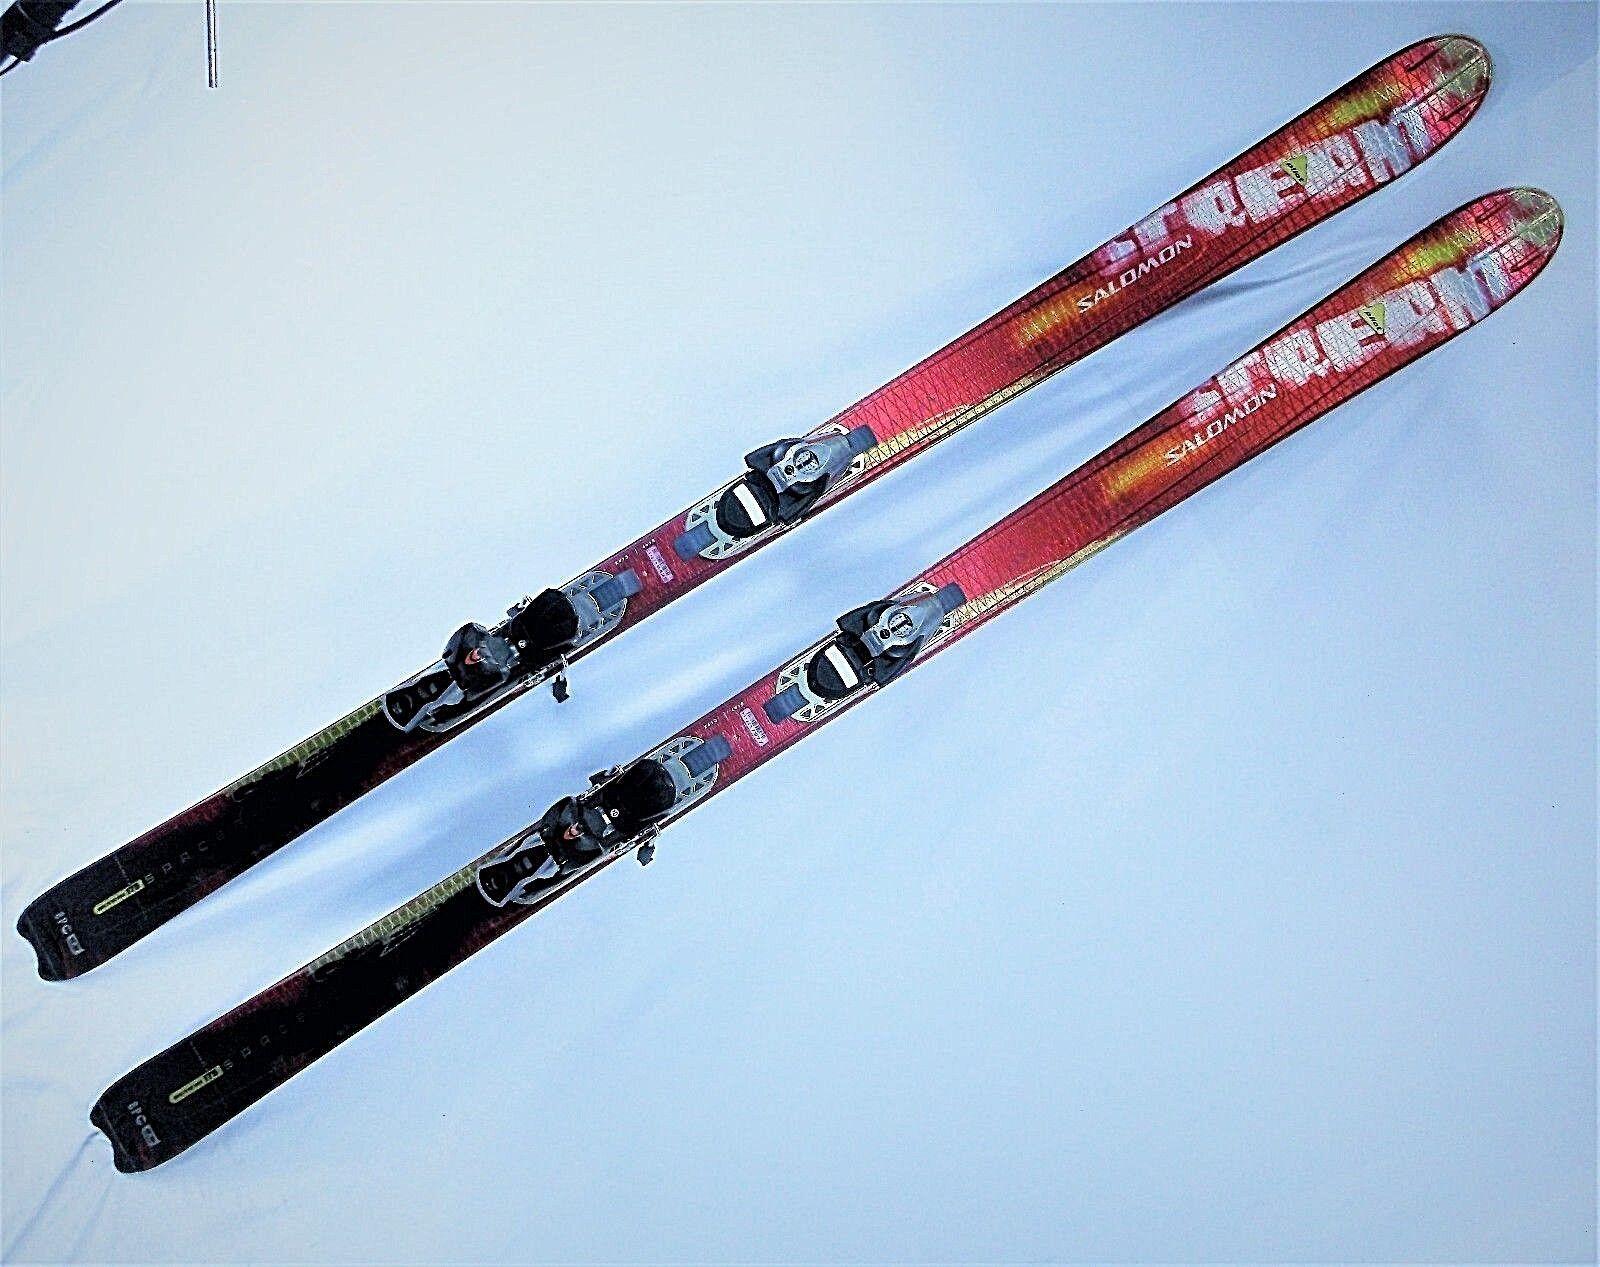 Salomon Pilot 8 Scream 175cm skis, New, with New Salomon Bindings